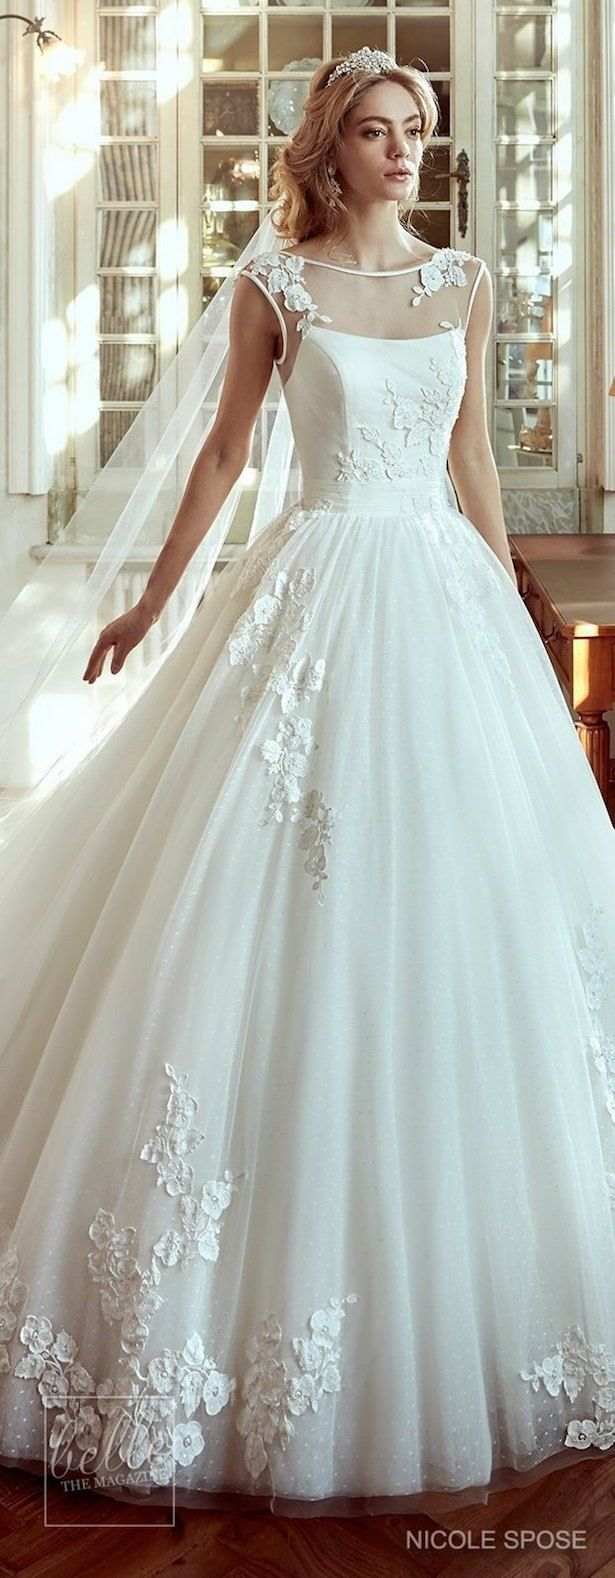 2359 best Wedding Dresses images on Pinterest | Wedding frocks ...